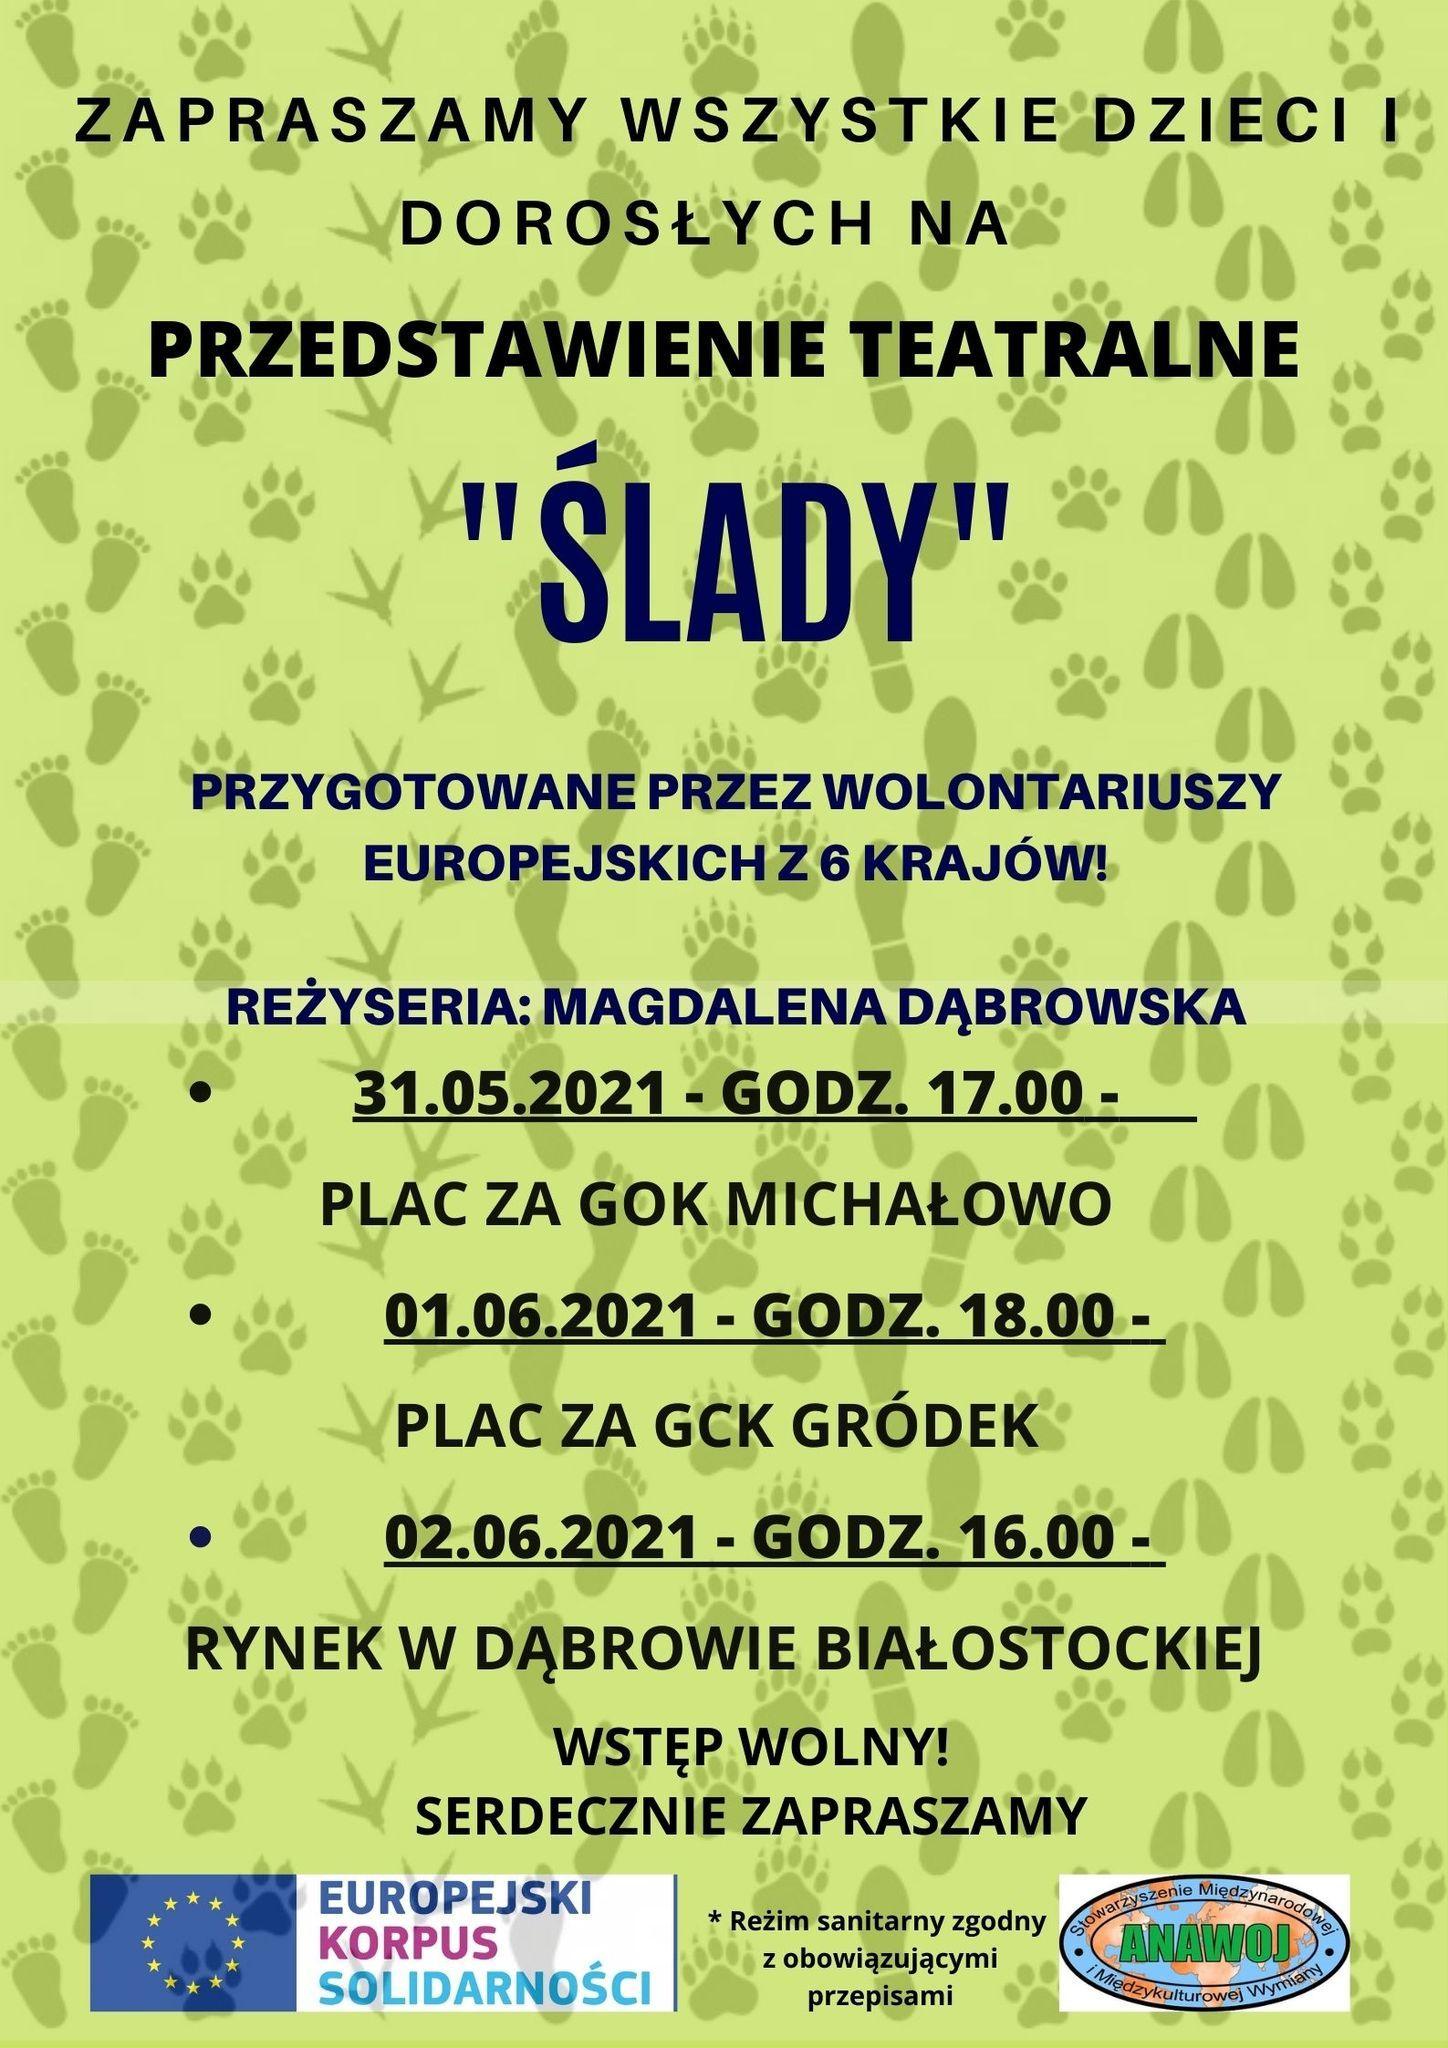 teatr_slady_anawoj_2021